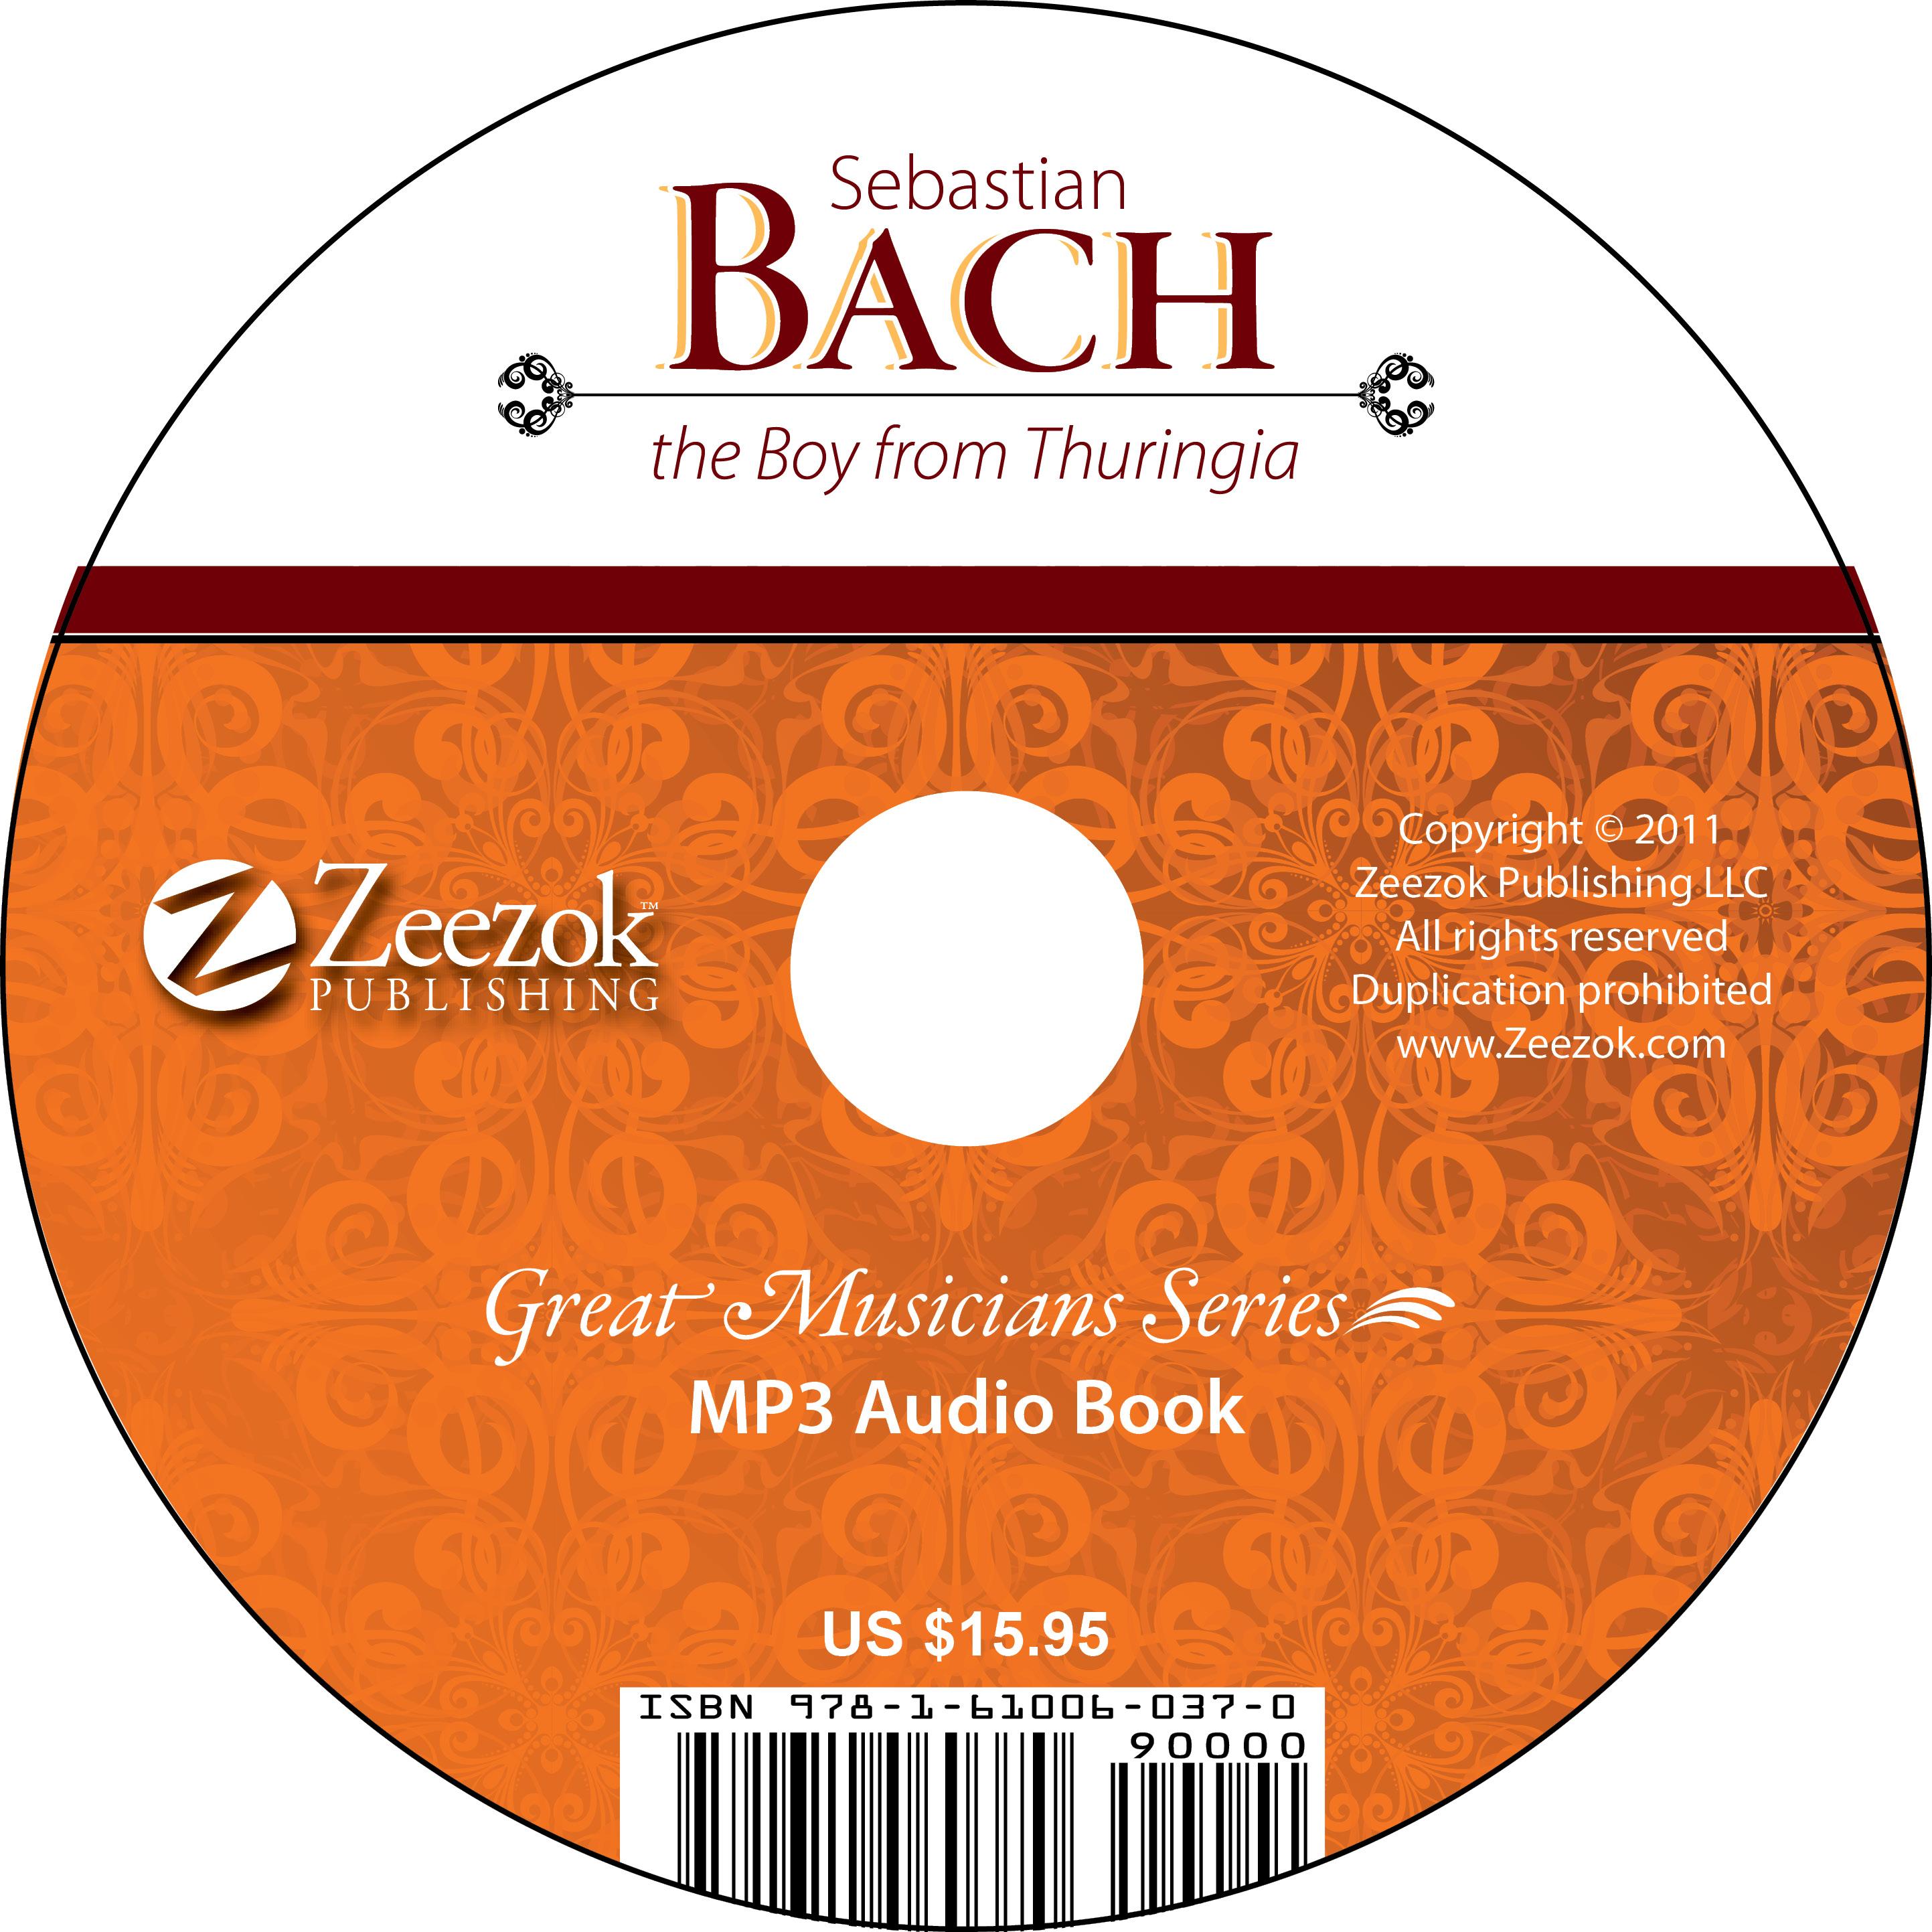 Sebastian Bach, The Boy from Thuringia Audio Book on CD ... - photo#9